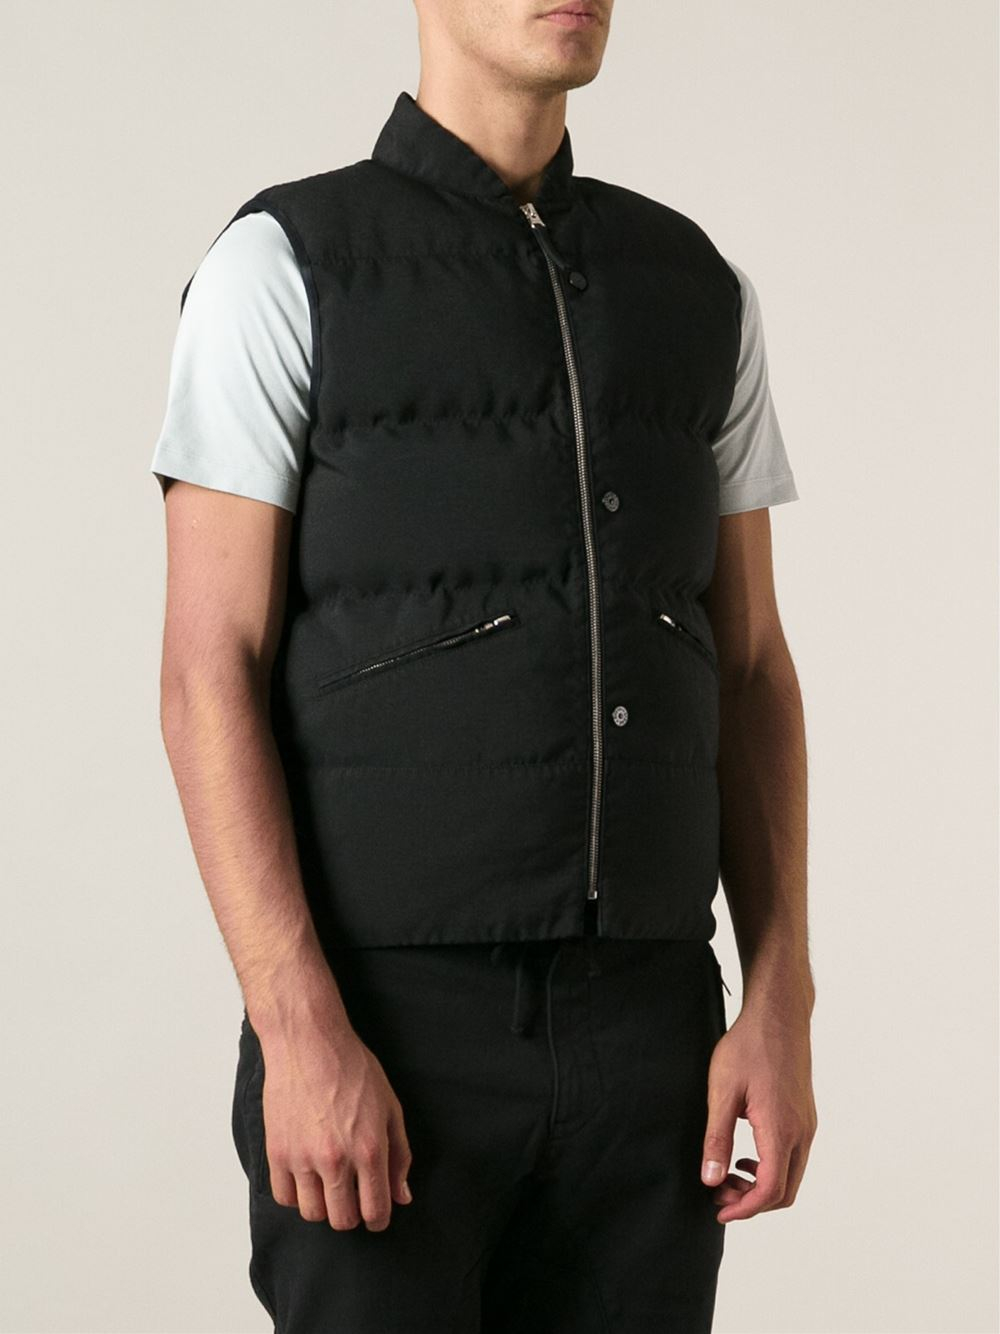 Stone Island Padded Vest In Black For Men Lyst